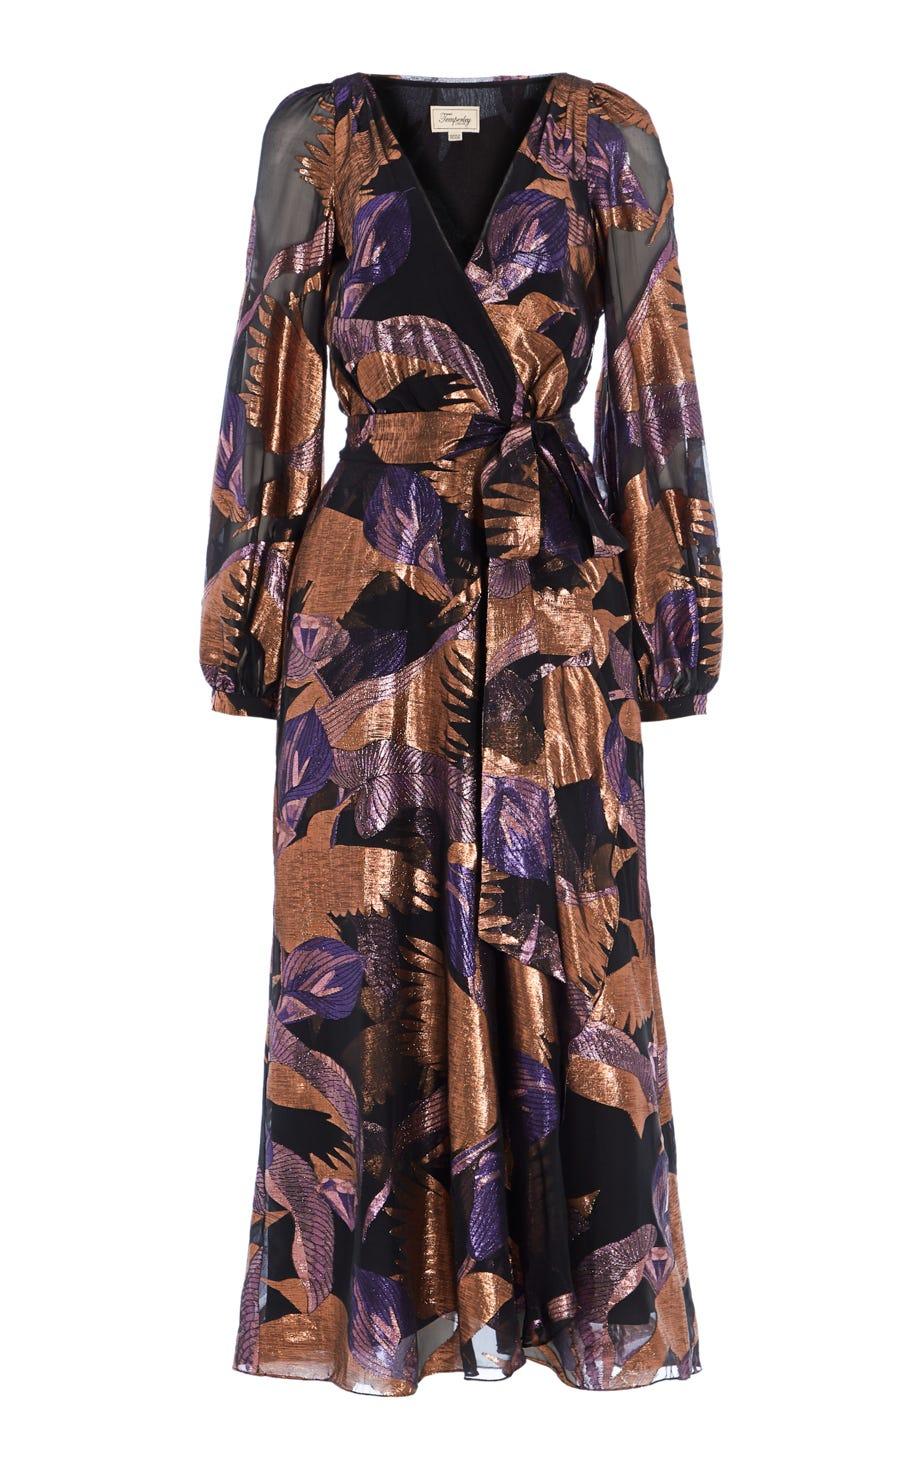 Kitty Filcoupe Wrap Dress